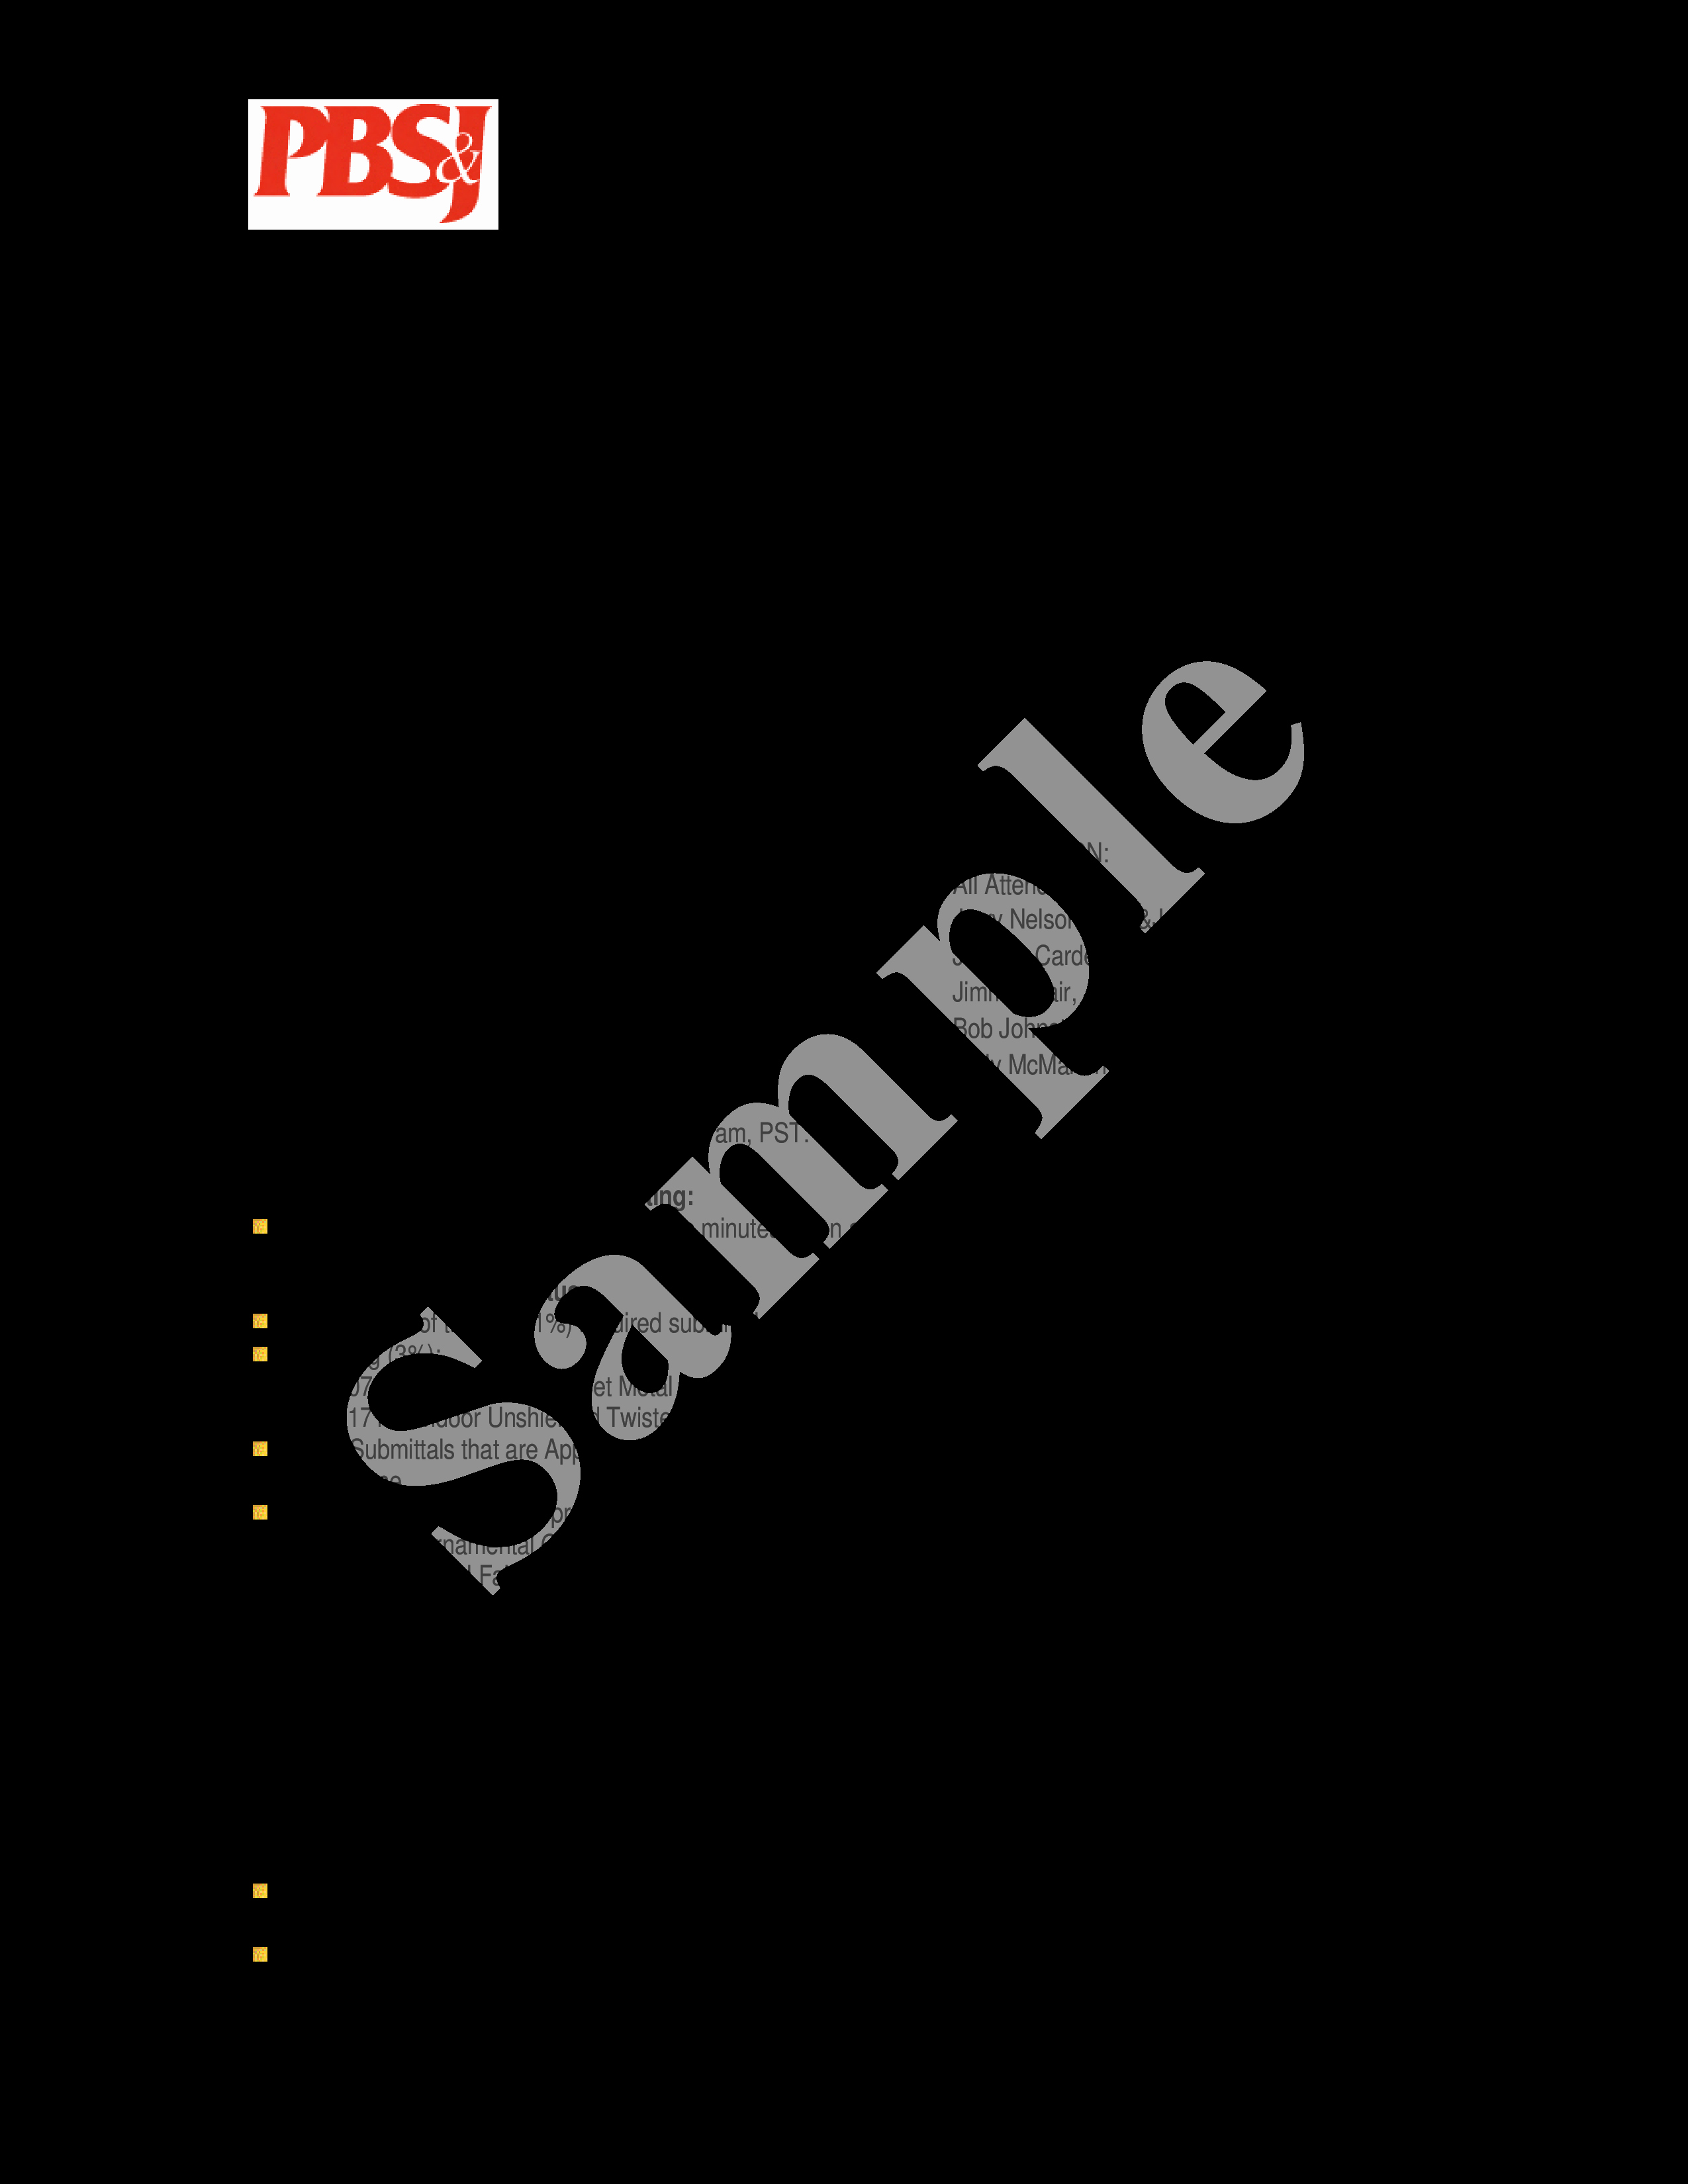 Sample Minutes Of the Meeting Elegant Free Progress Meeting Minutes Sample